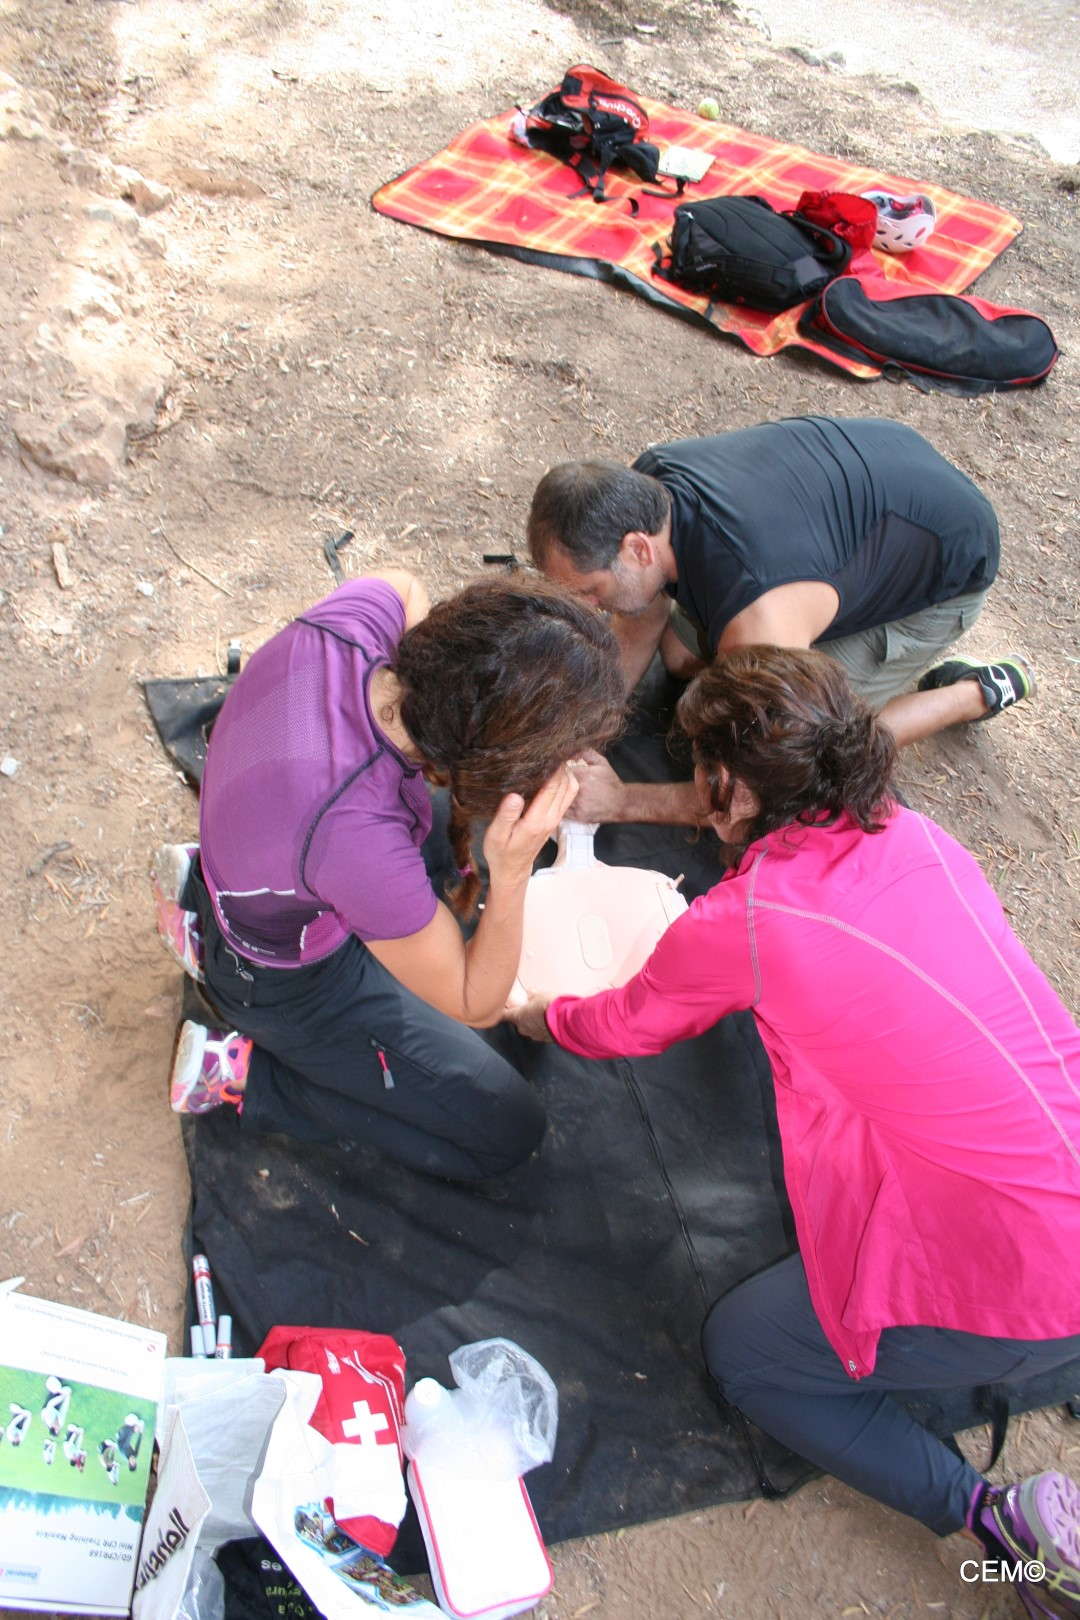 actividad-cem-escalada-taller-primeros-auxilios-2016-02